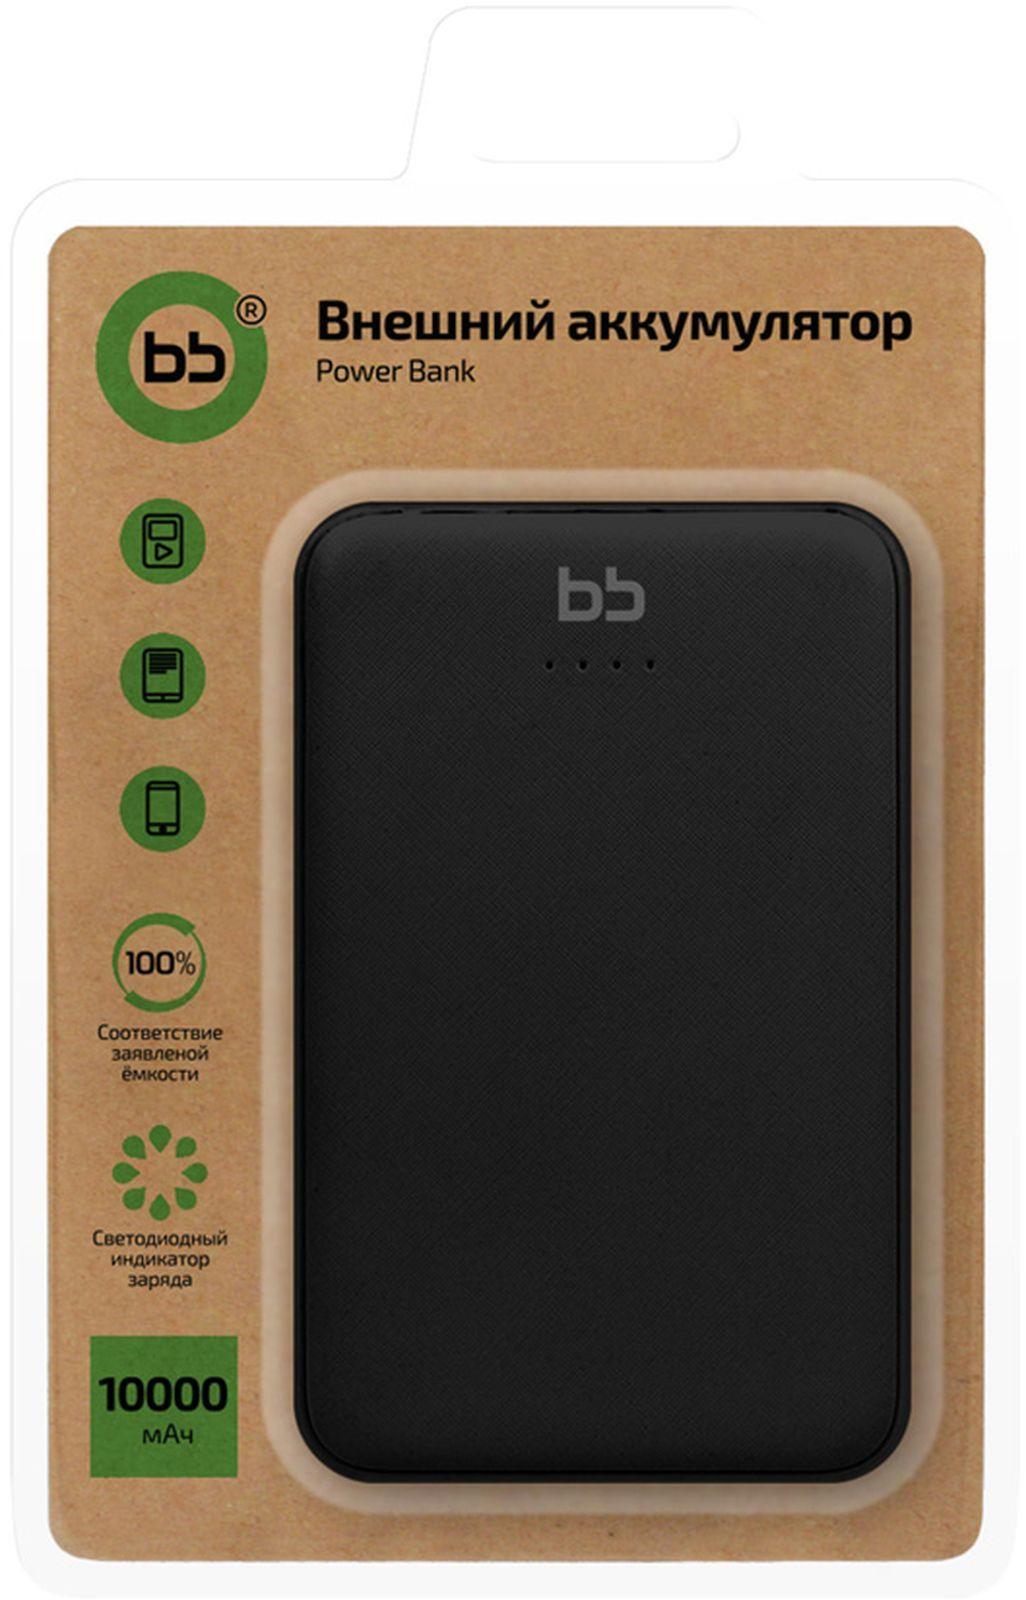 Фото - Внешний аккумулятор Nobby BB-PB-10-06 10000 мАч, черный аккумулятор